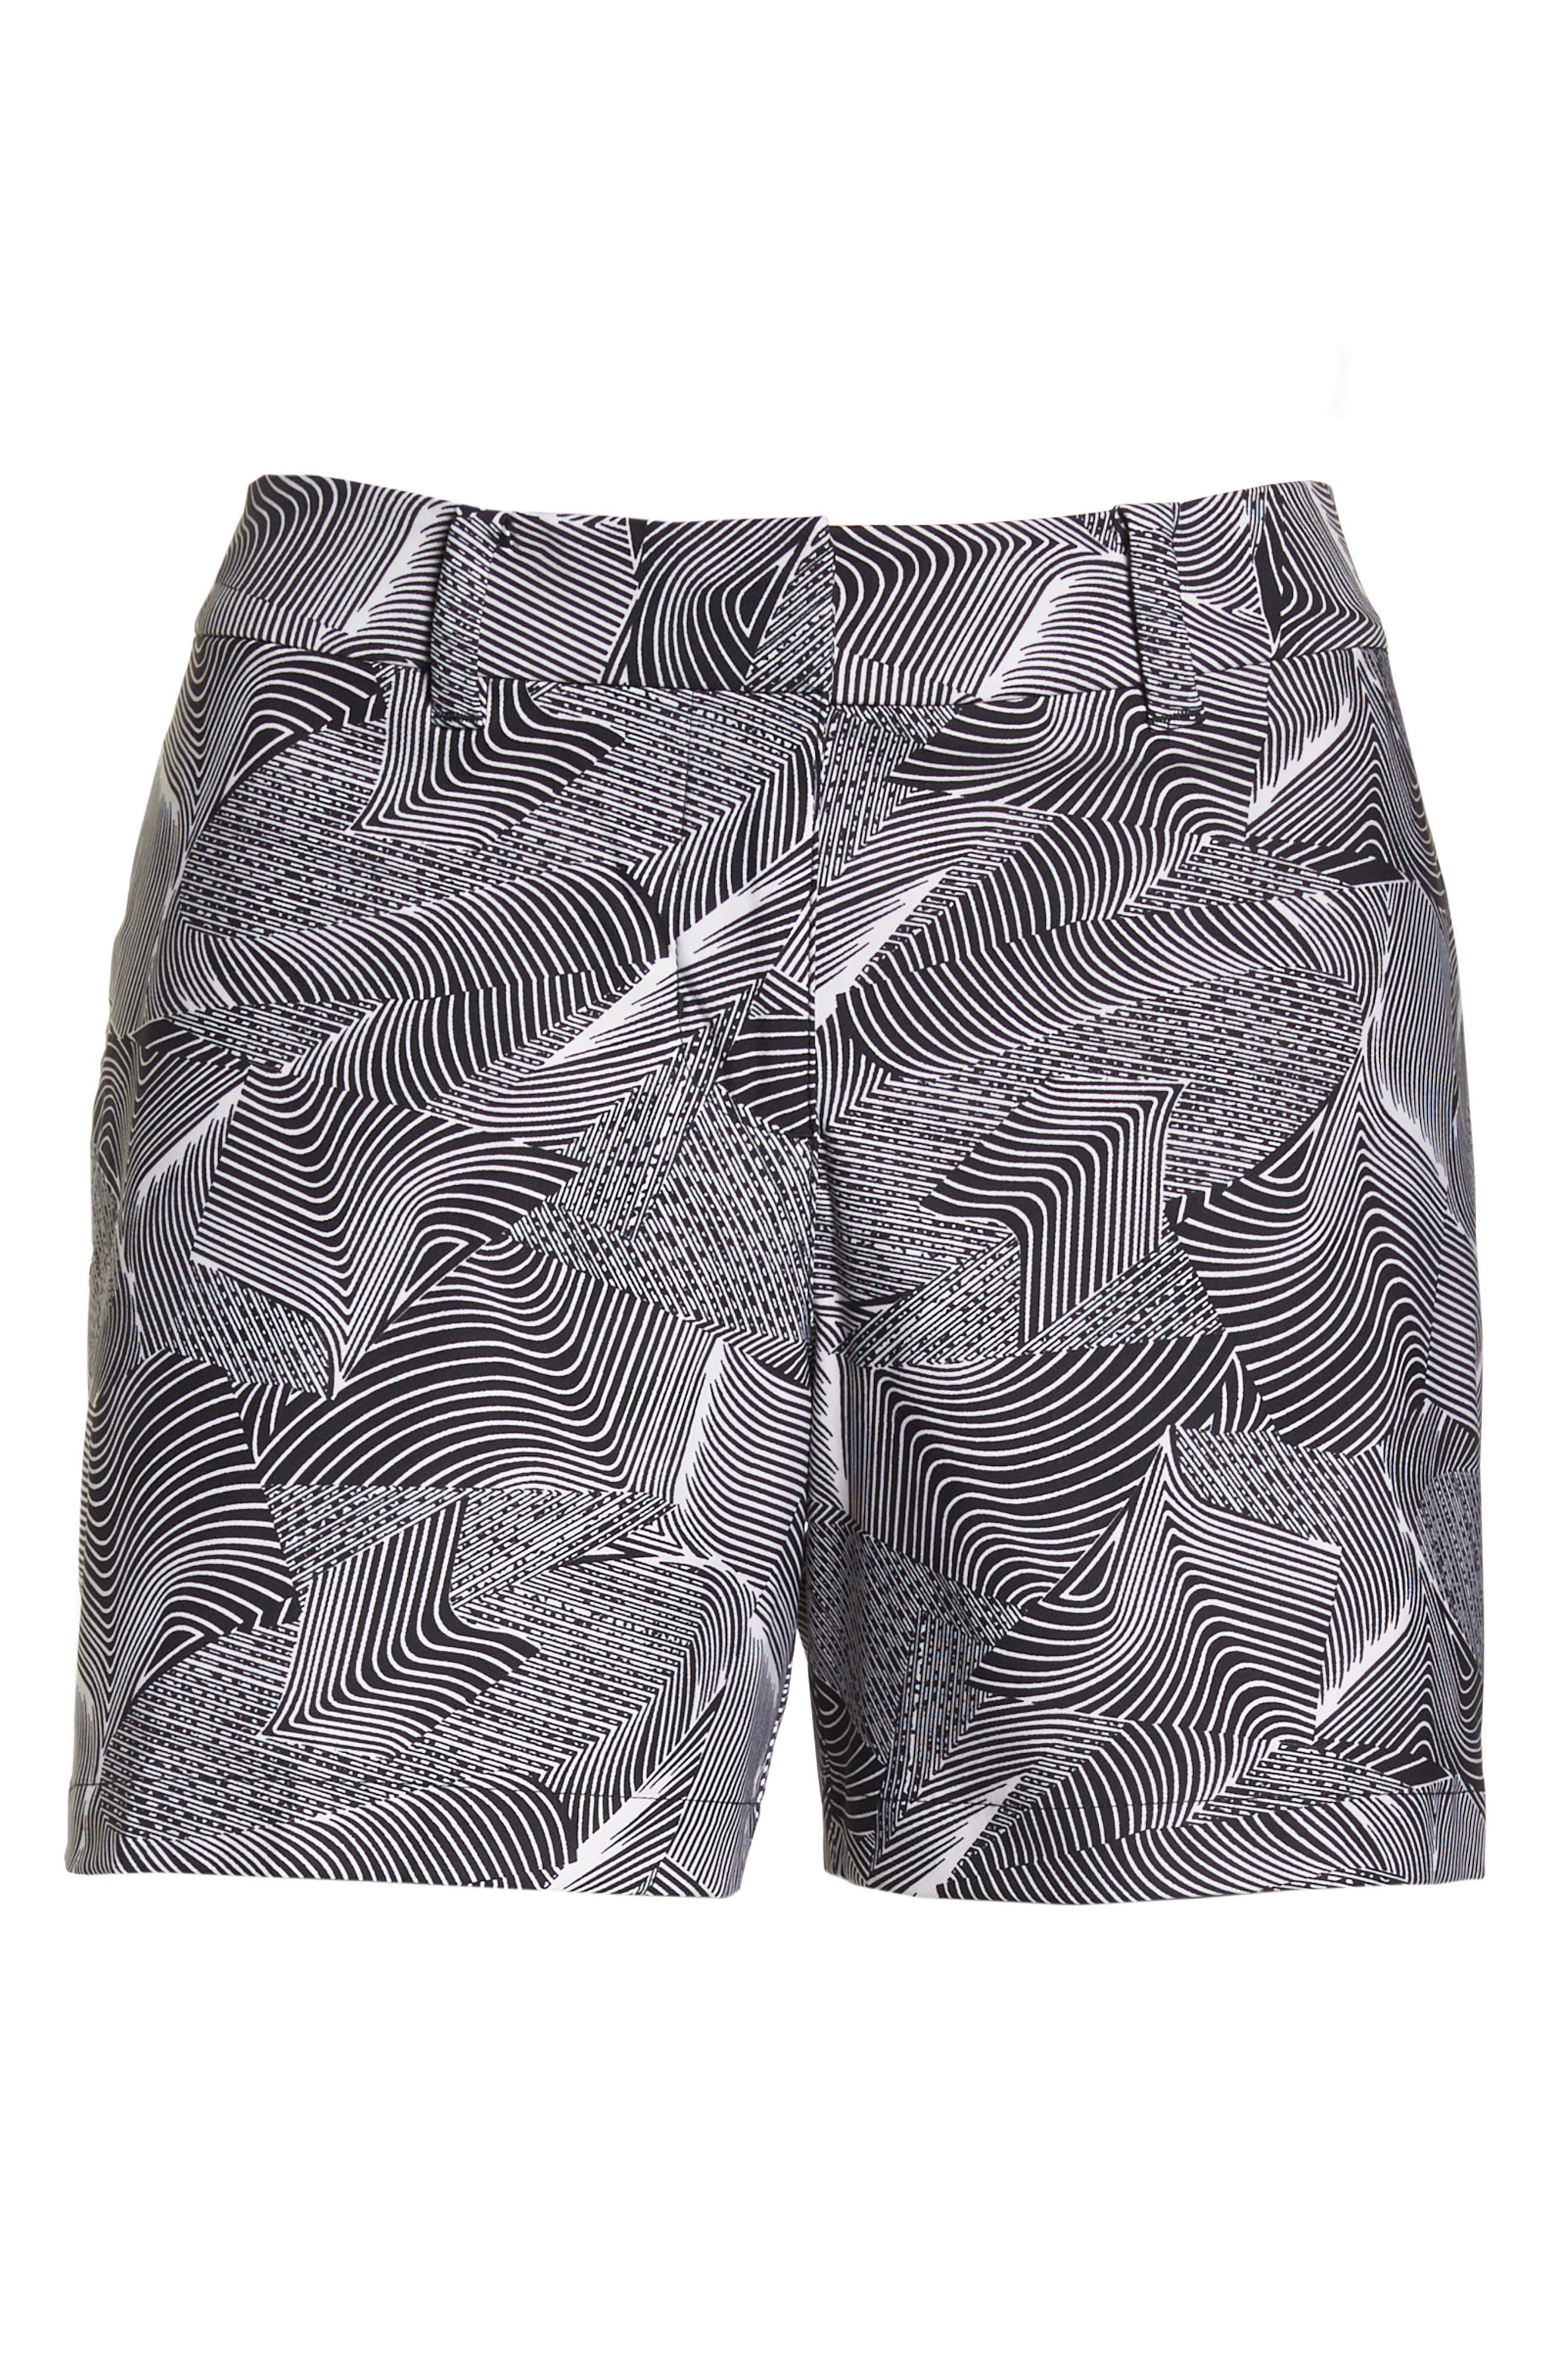 Flex Golf Shorts,                             Alternate thumbnail 7, color,                             White/ Black/ White